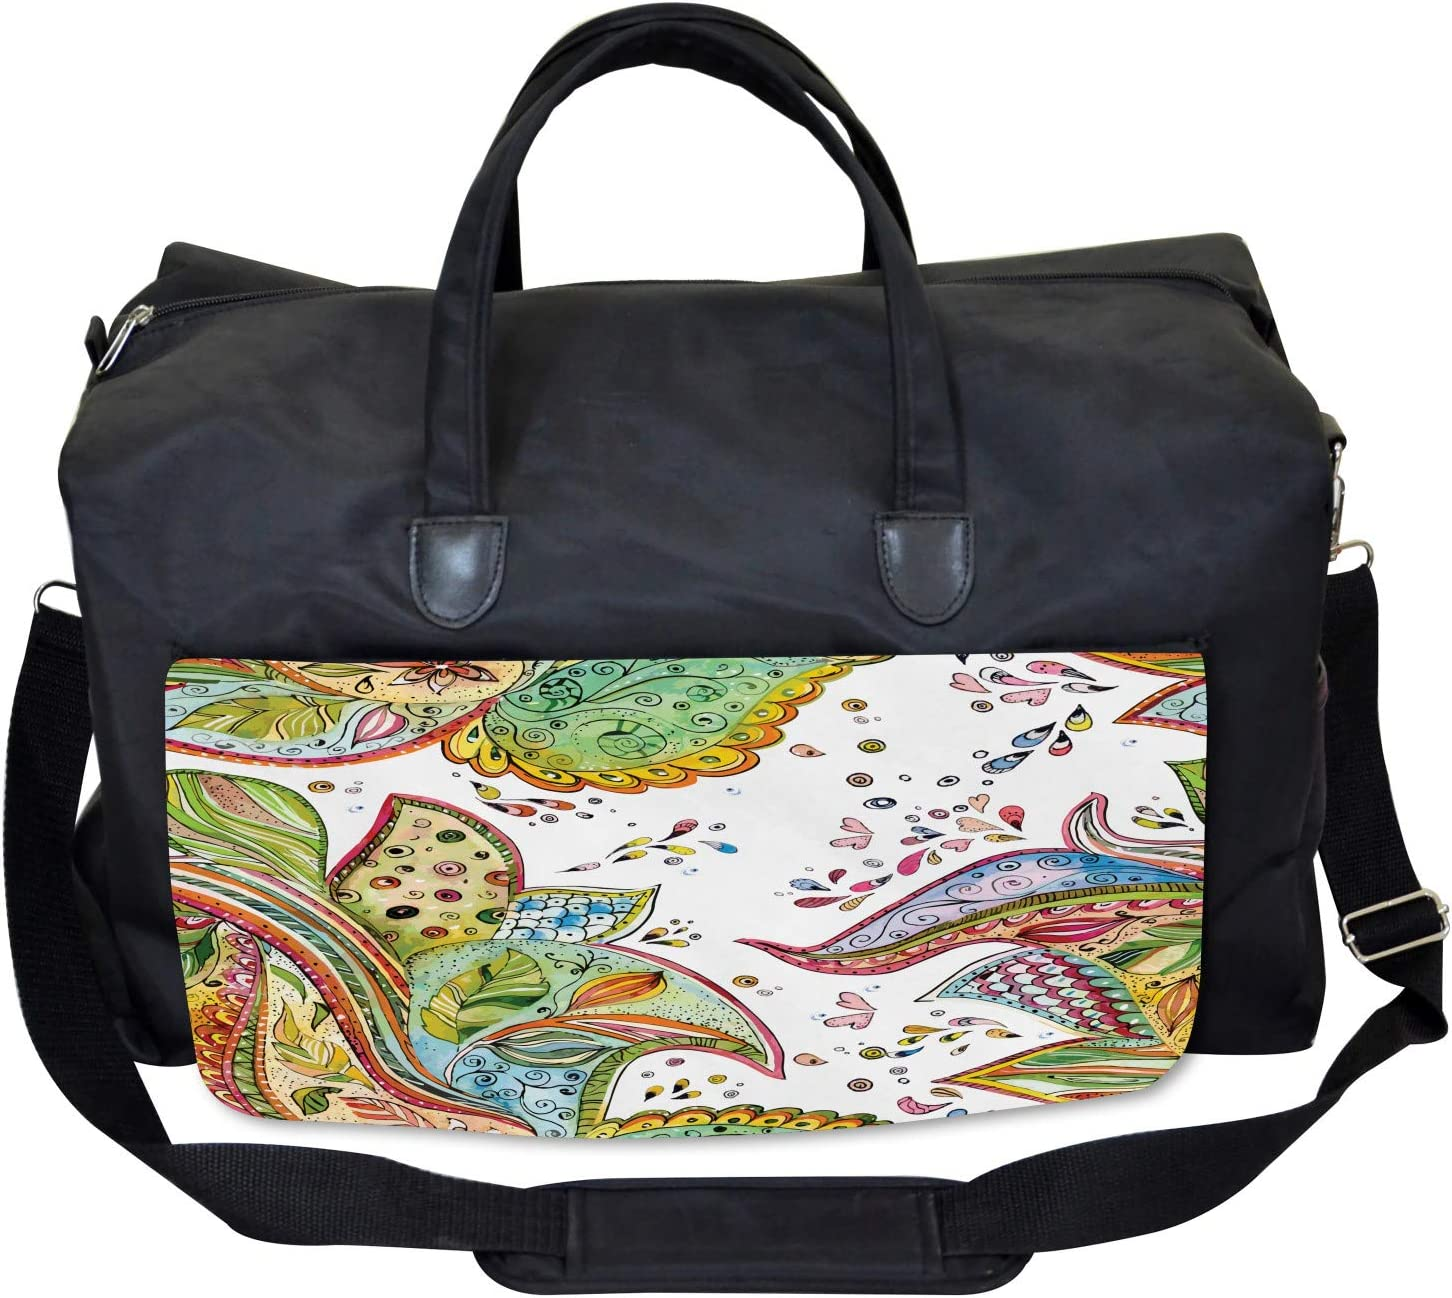 Leaves Flowers Hearts Large Weekender Carry-on Ambesonne Grunge Gym Bag